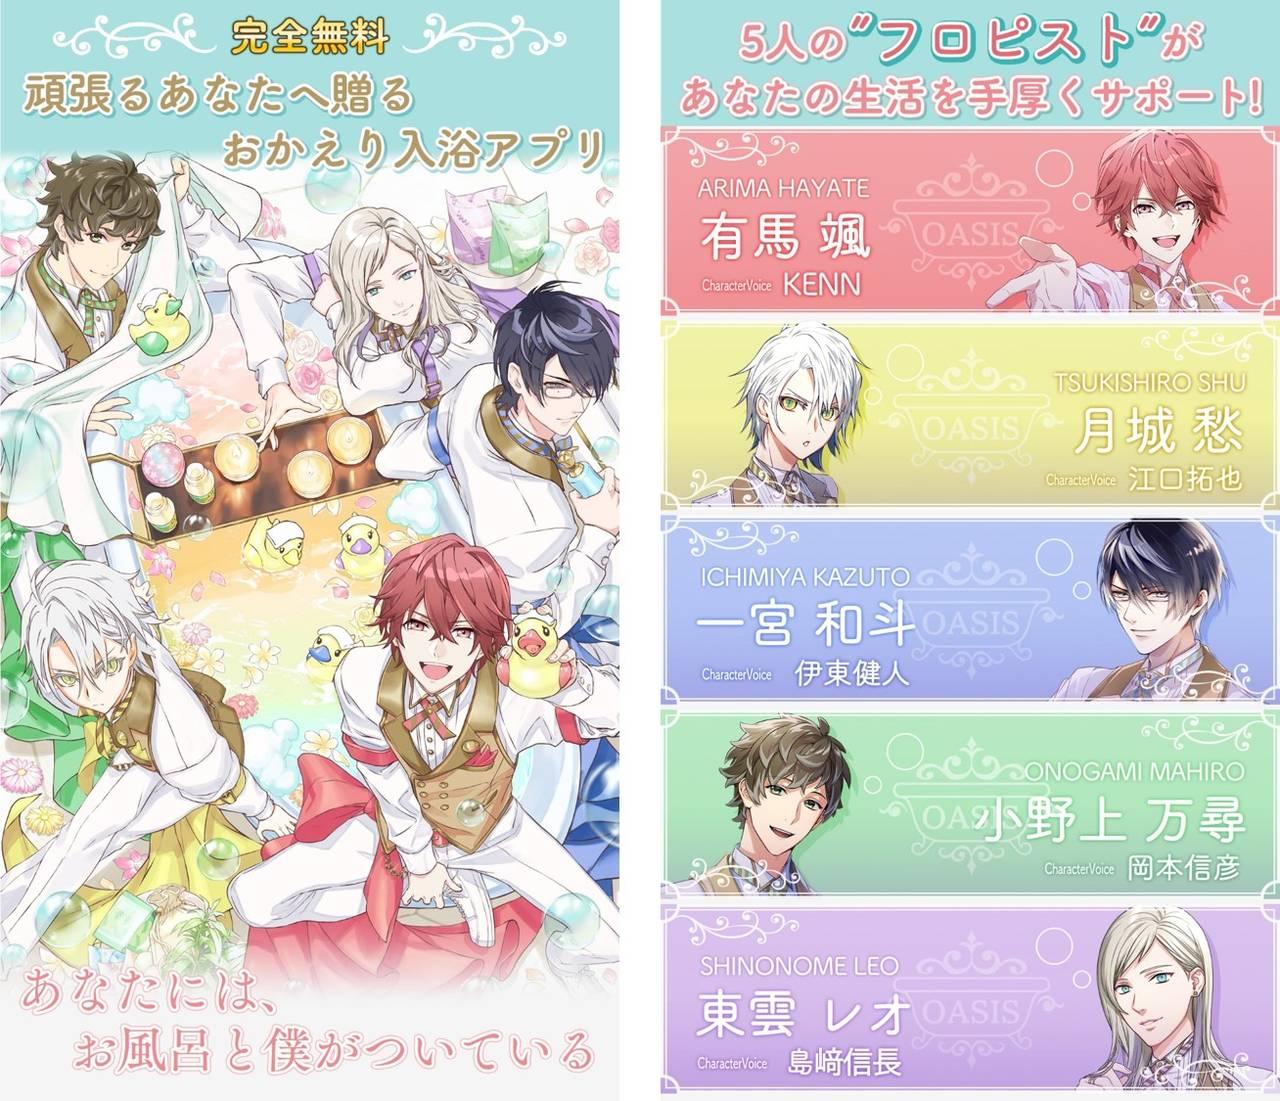 KENN、伊東健人、江口拓也ら出演の恋愛ゲーム『ふろ恋 私だけの入浴執事』遂にリリース!